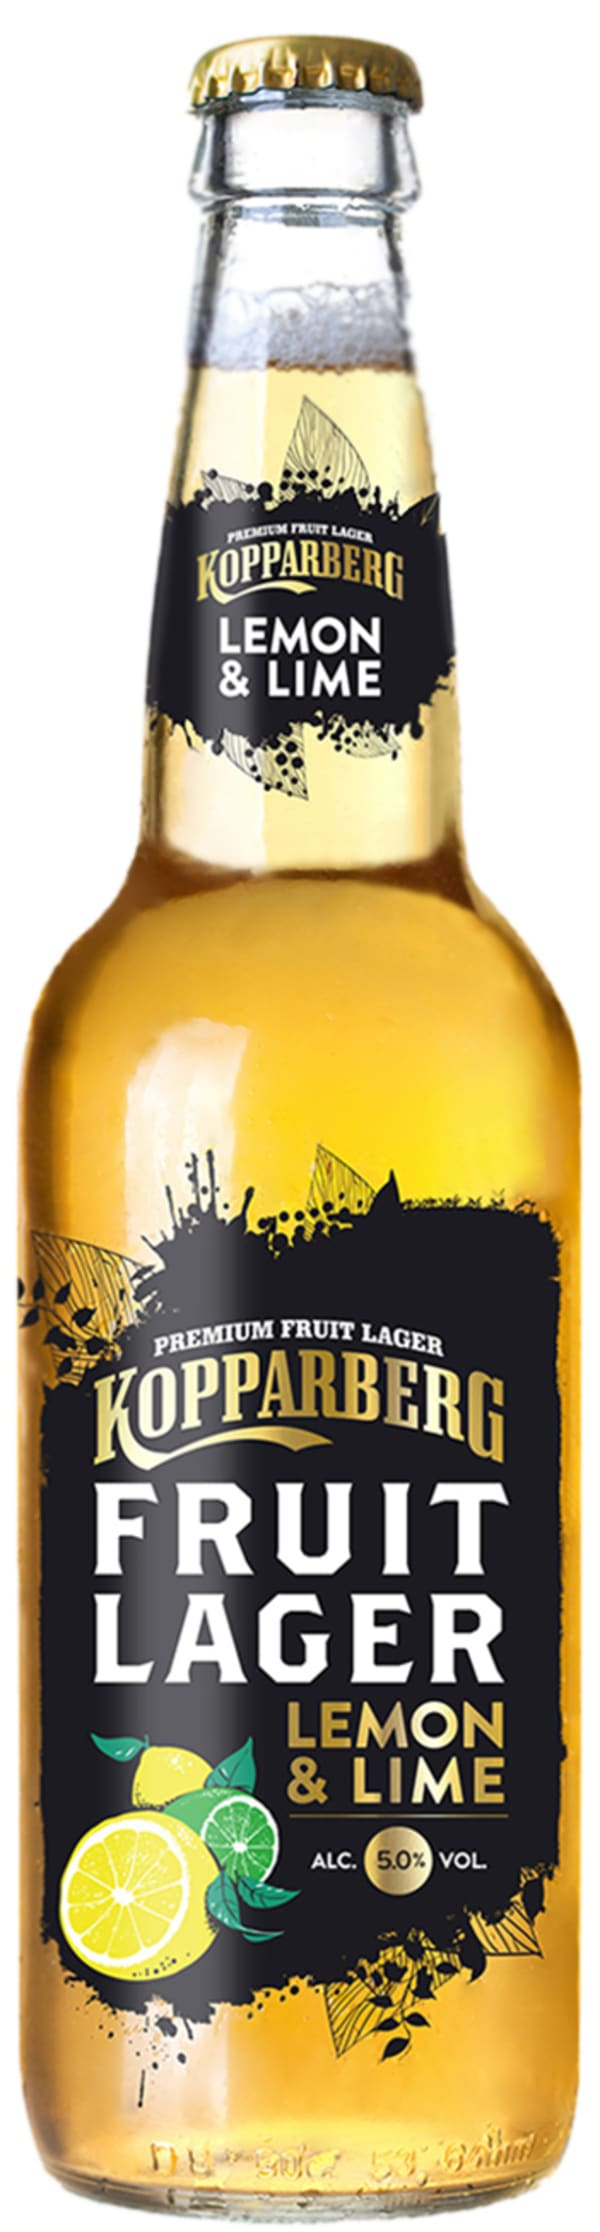 Morrisons kopparberg mixed fruits 250ml product information - Zoom Icon Kopparberg Fruit Lager Lemon Lime Product Photo